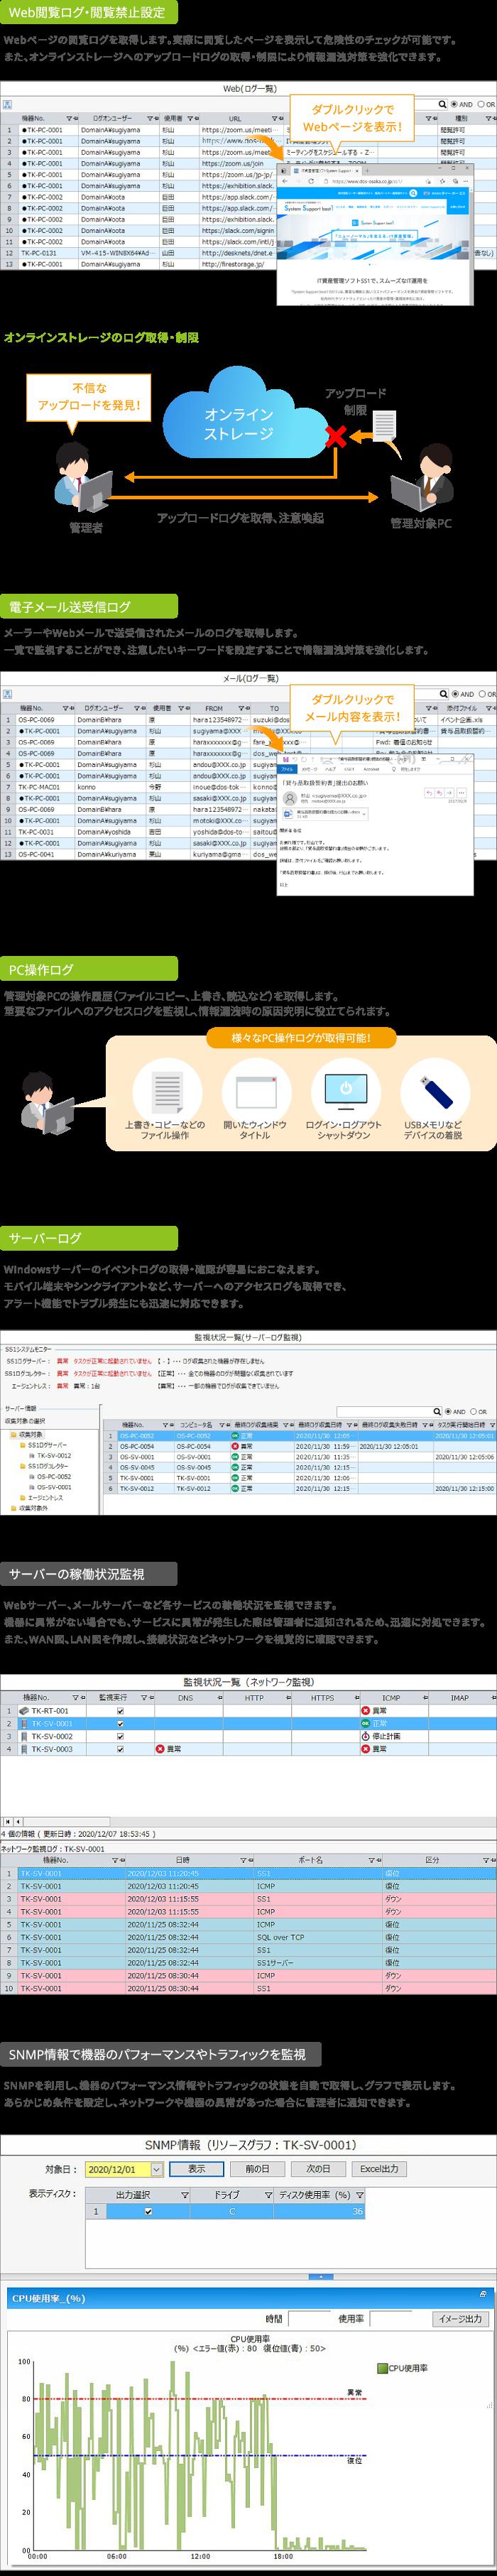 System Support best1(SS1) 「ログ監視」製品詳細2